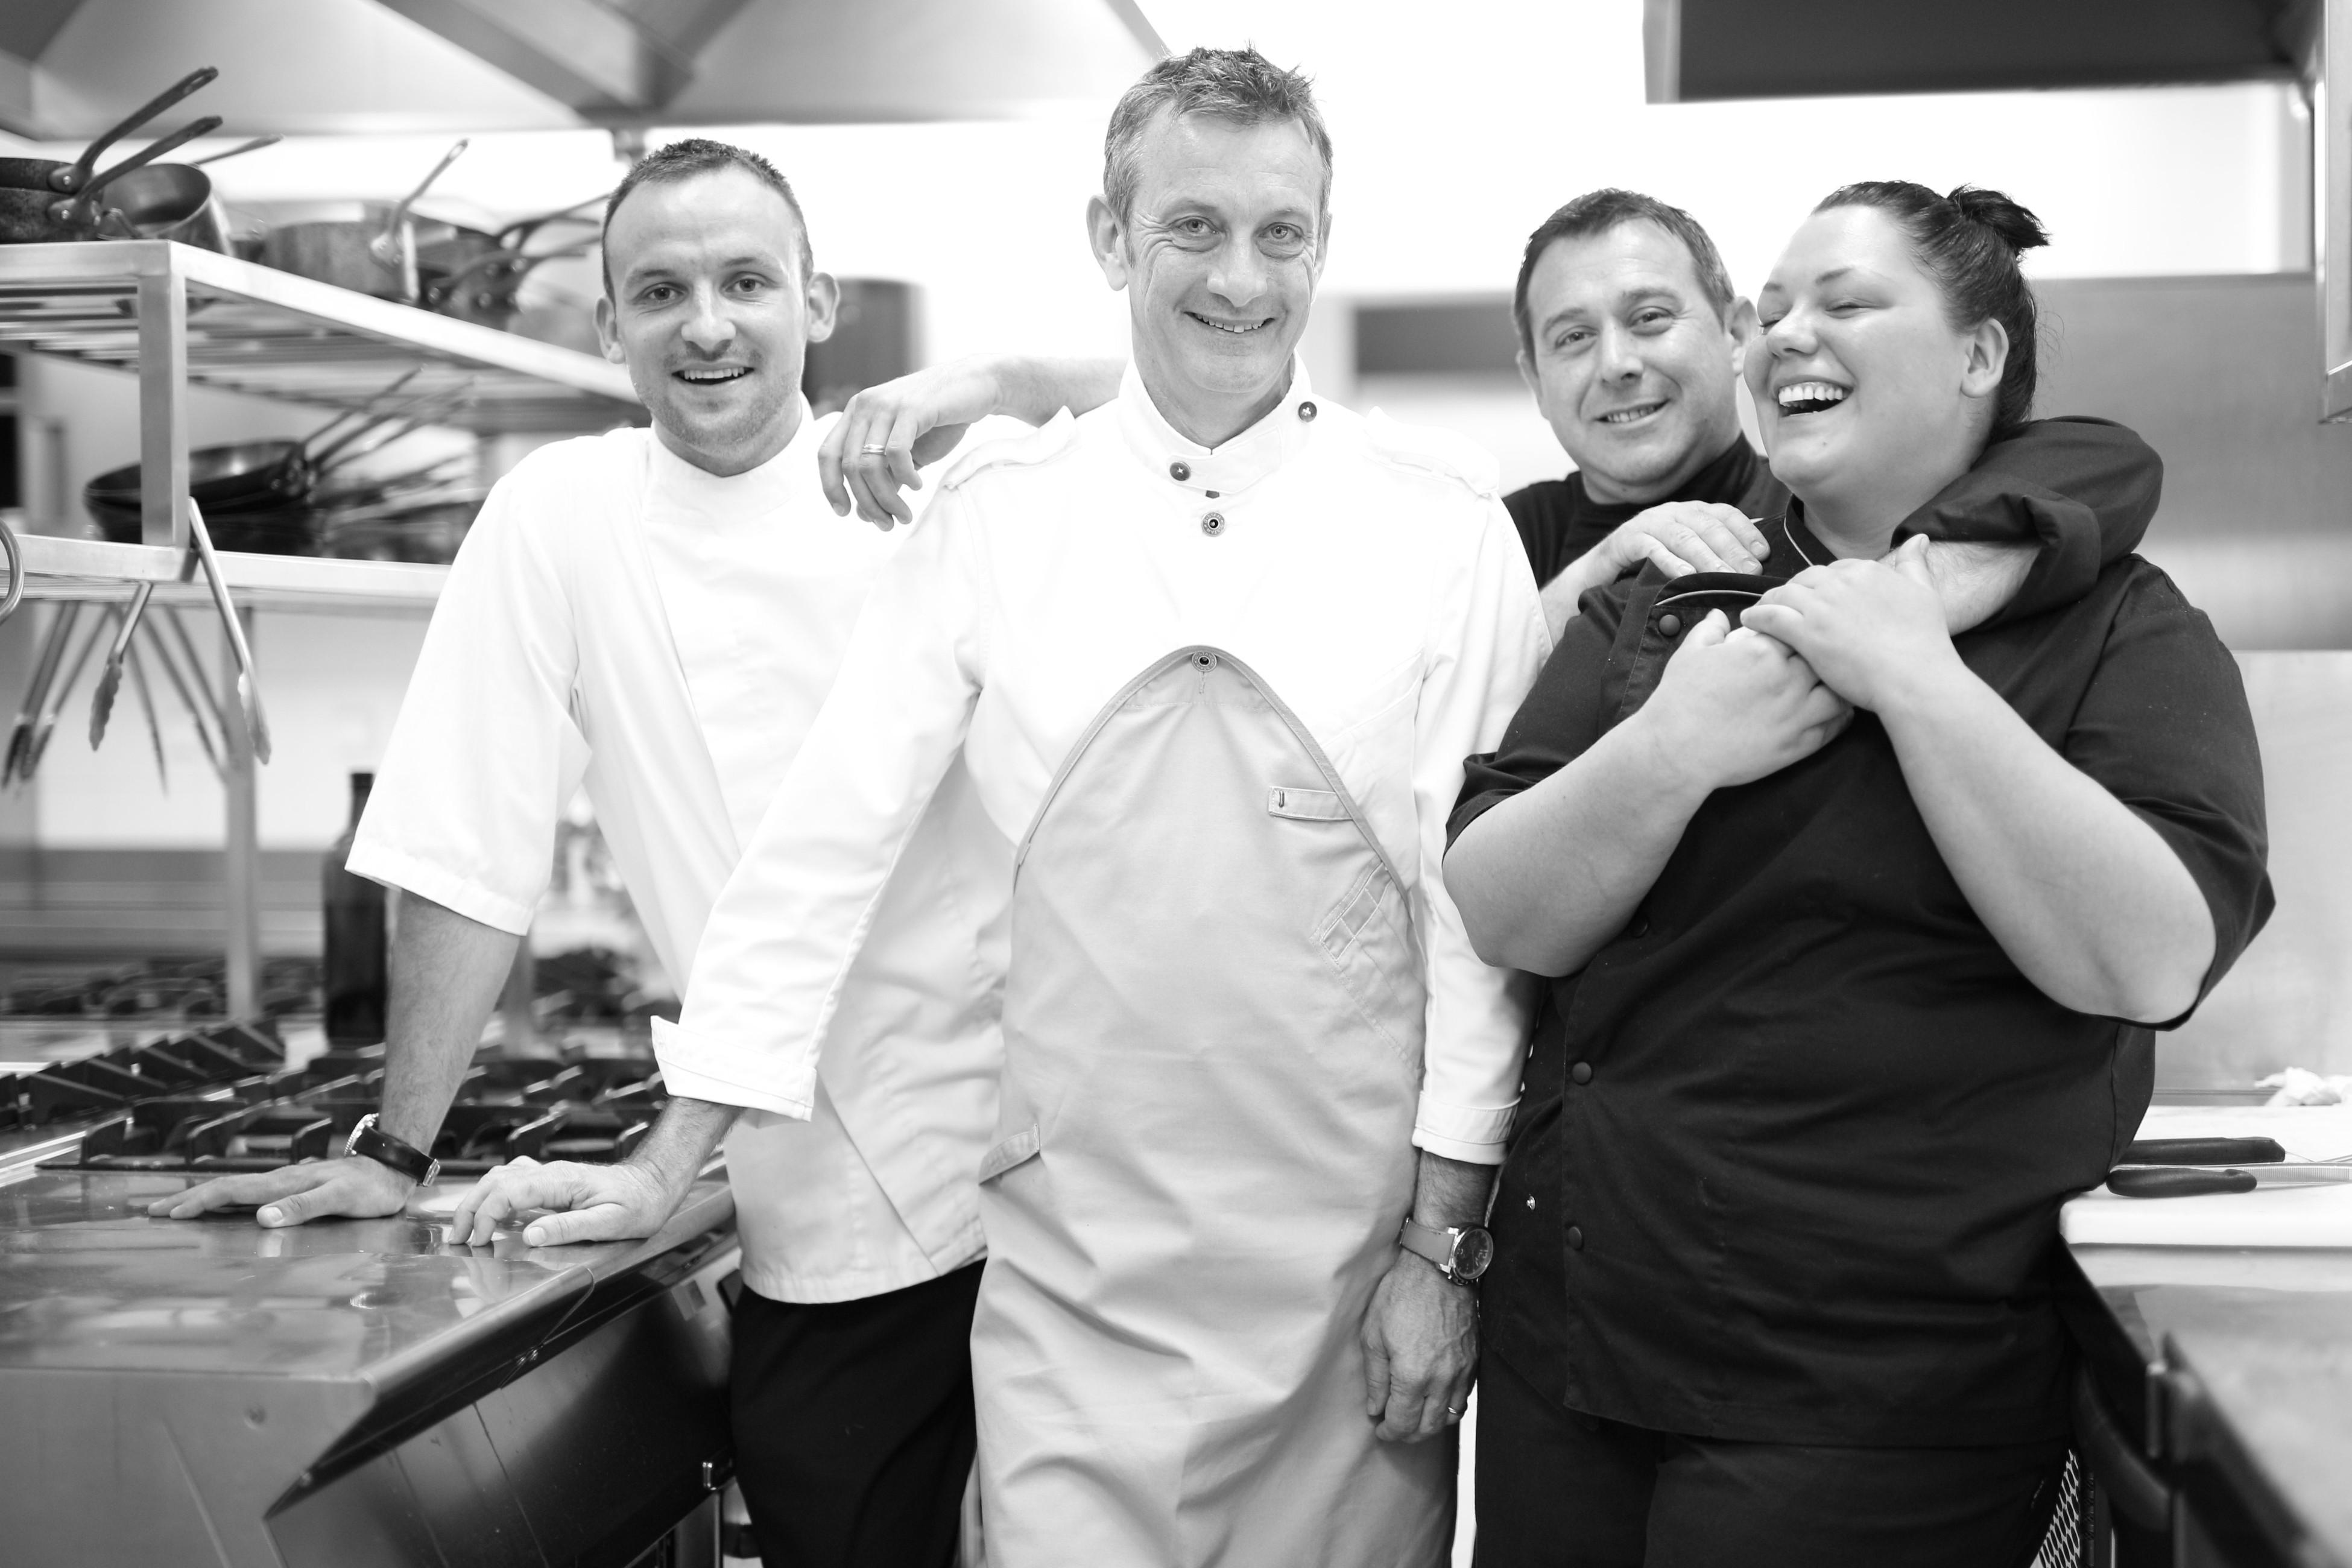 New head chef of Maistra's luxury hotels